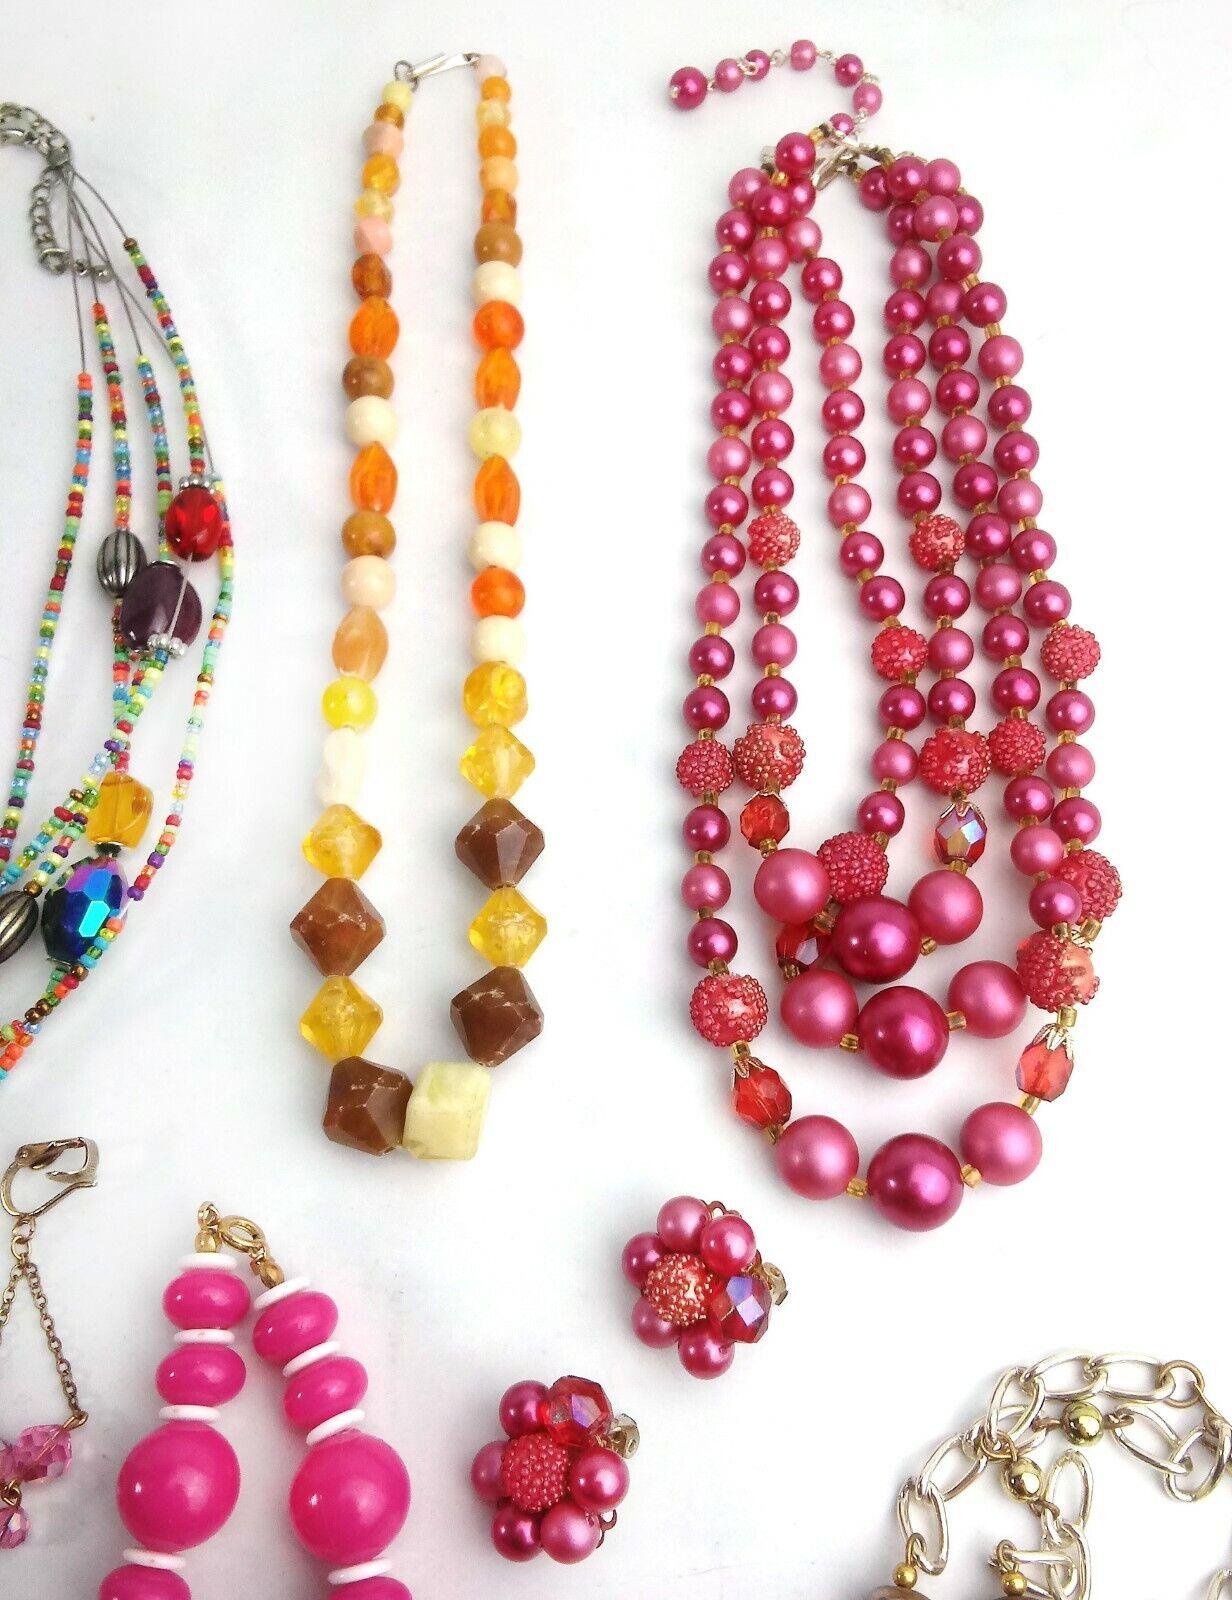 Costume Jewelry Lot Necklaces Bracelet Earrings - image 4